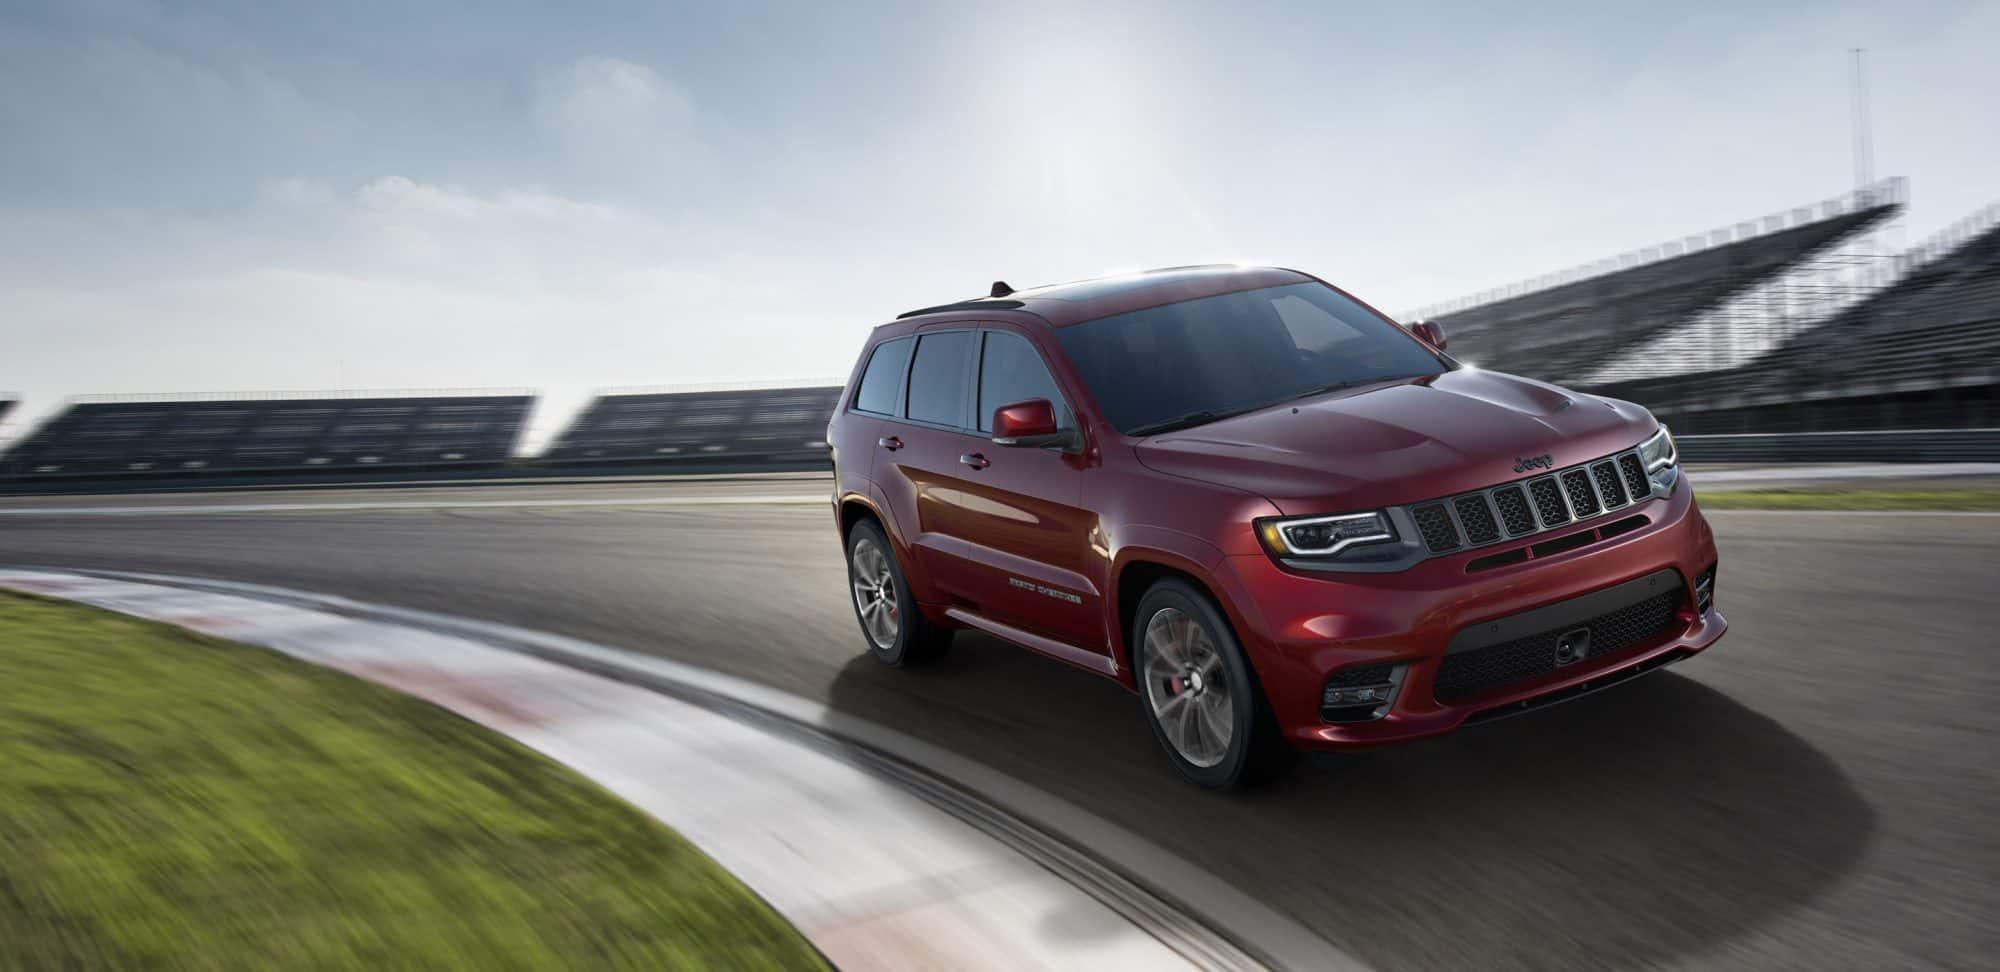 New 2018 Jeep Grand Cherokee for sale near Thomsasville GA